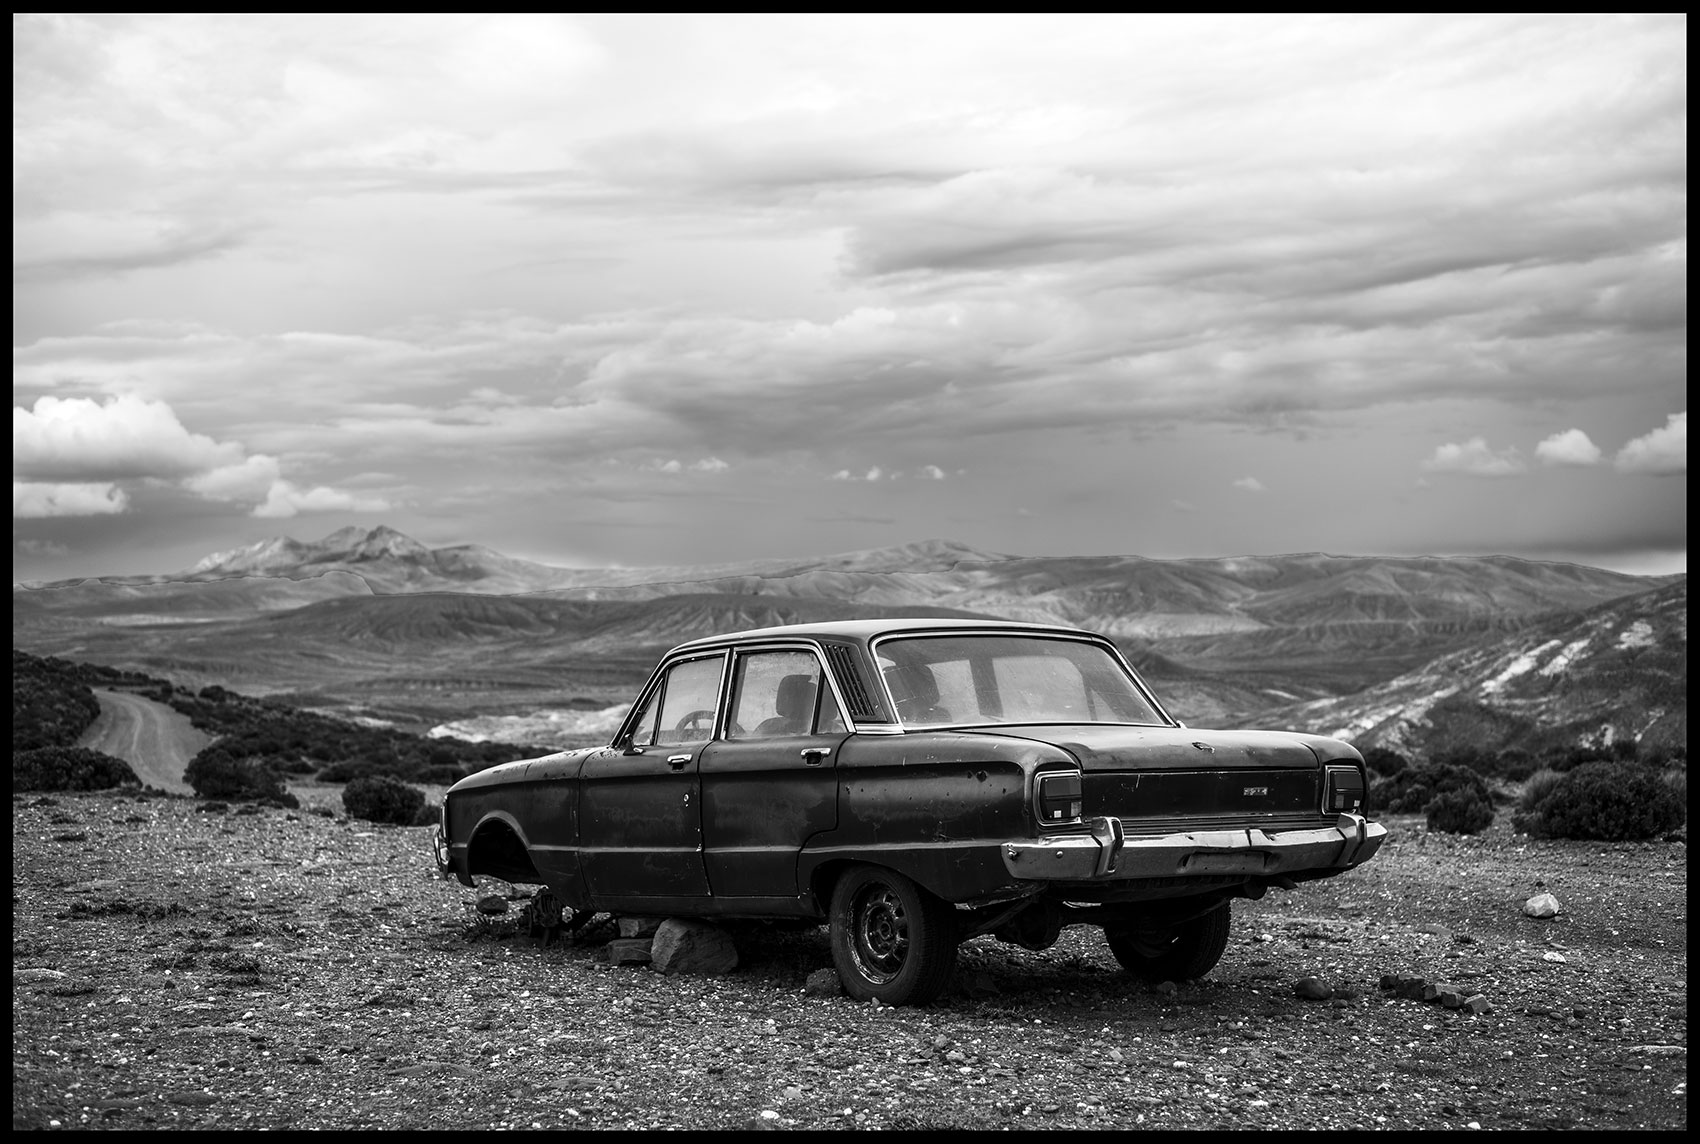 Fine Corsa - Street Photography | Stefano Paradiso - Photographer